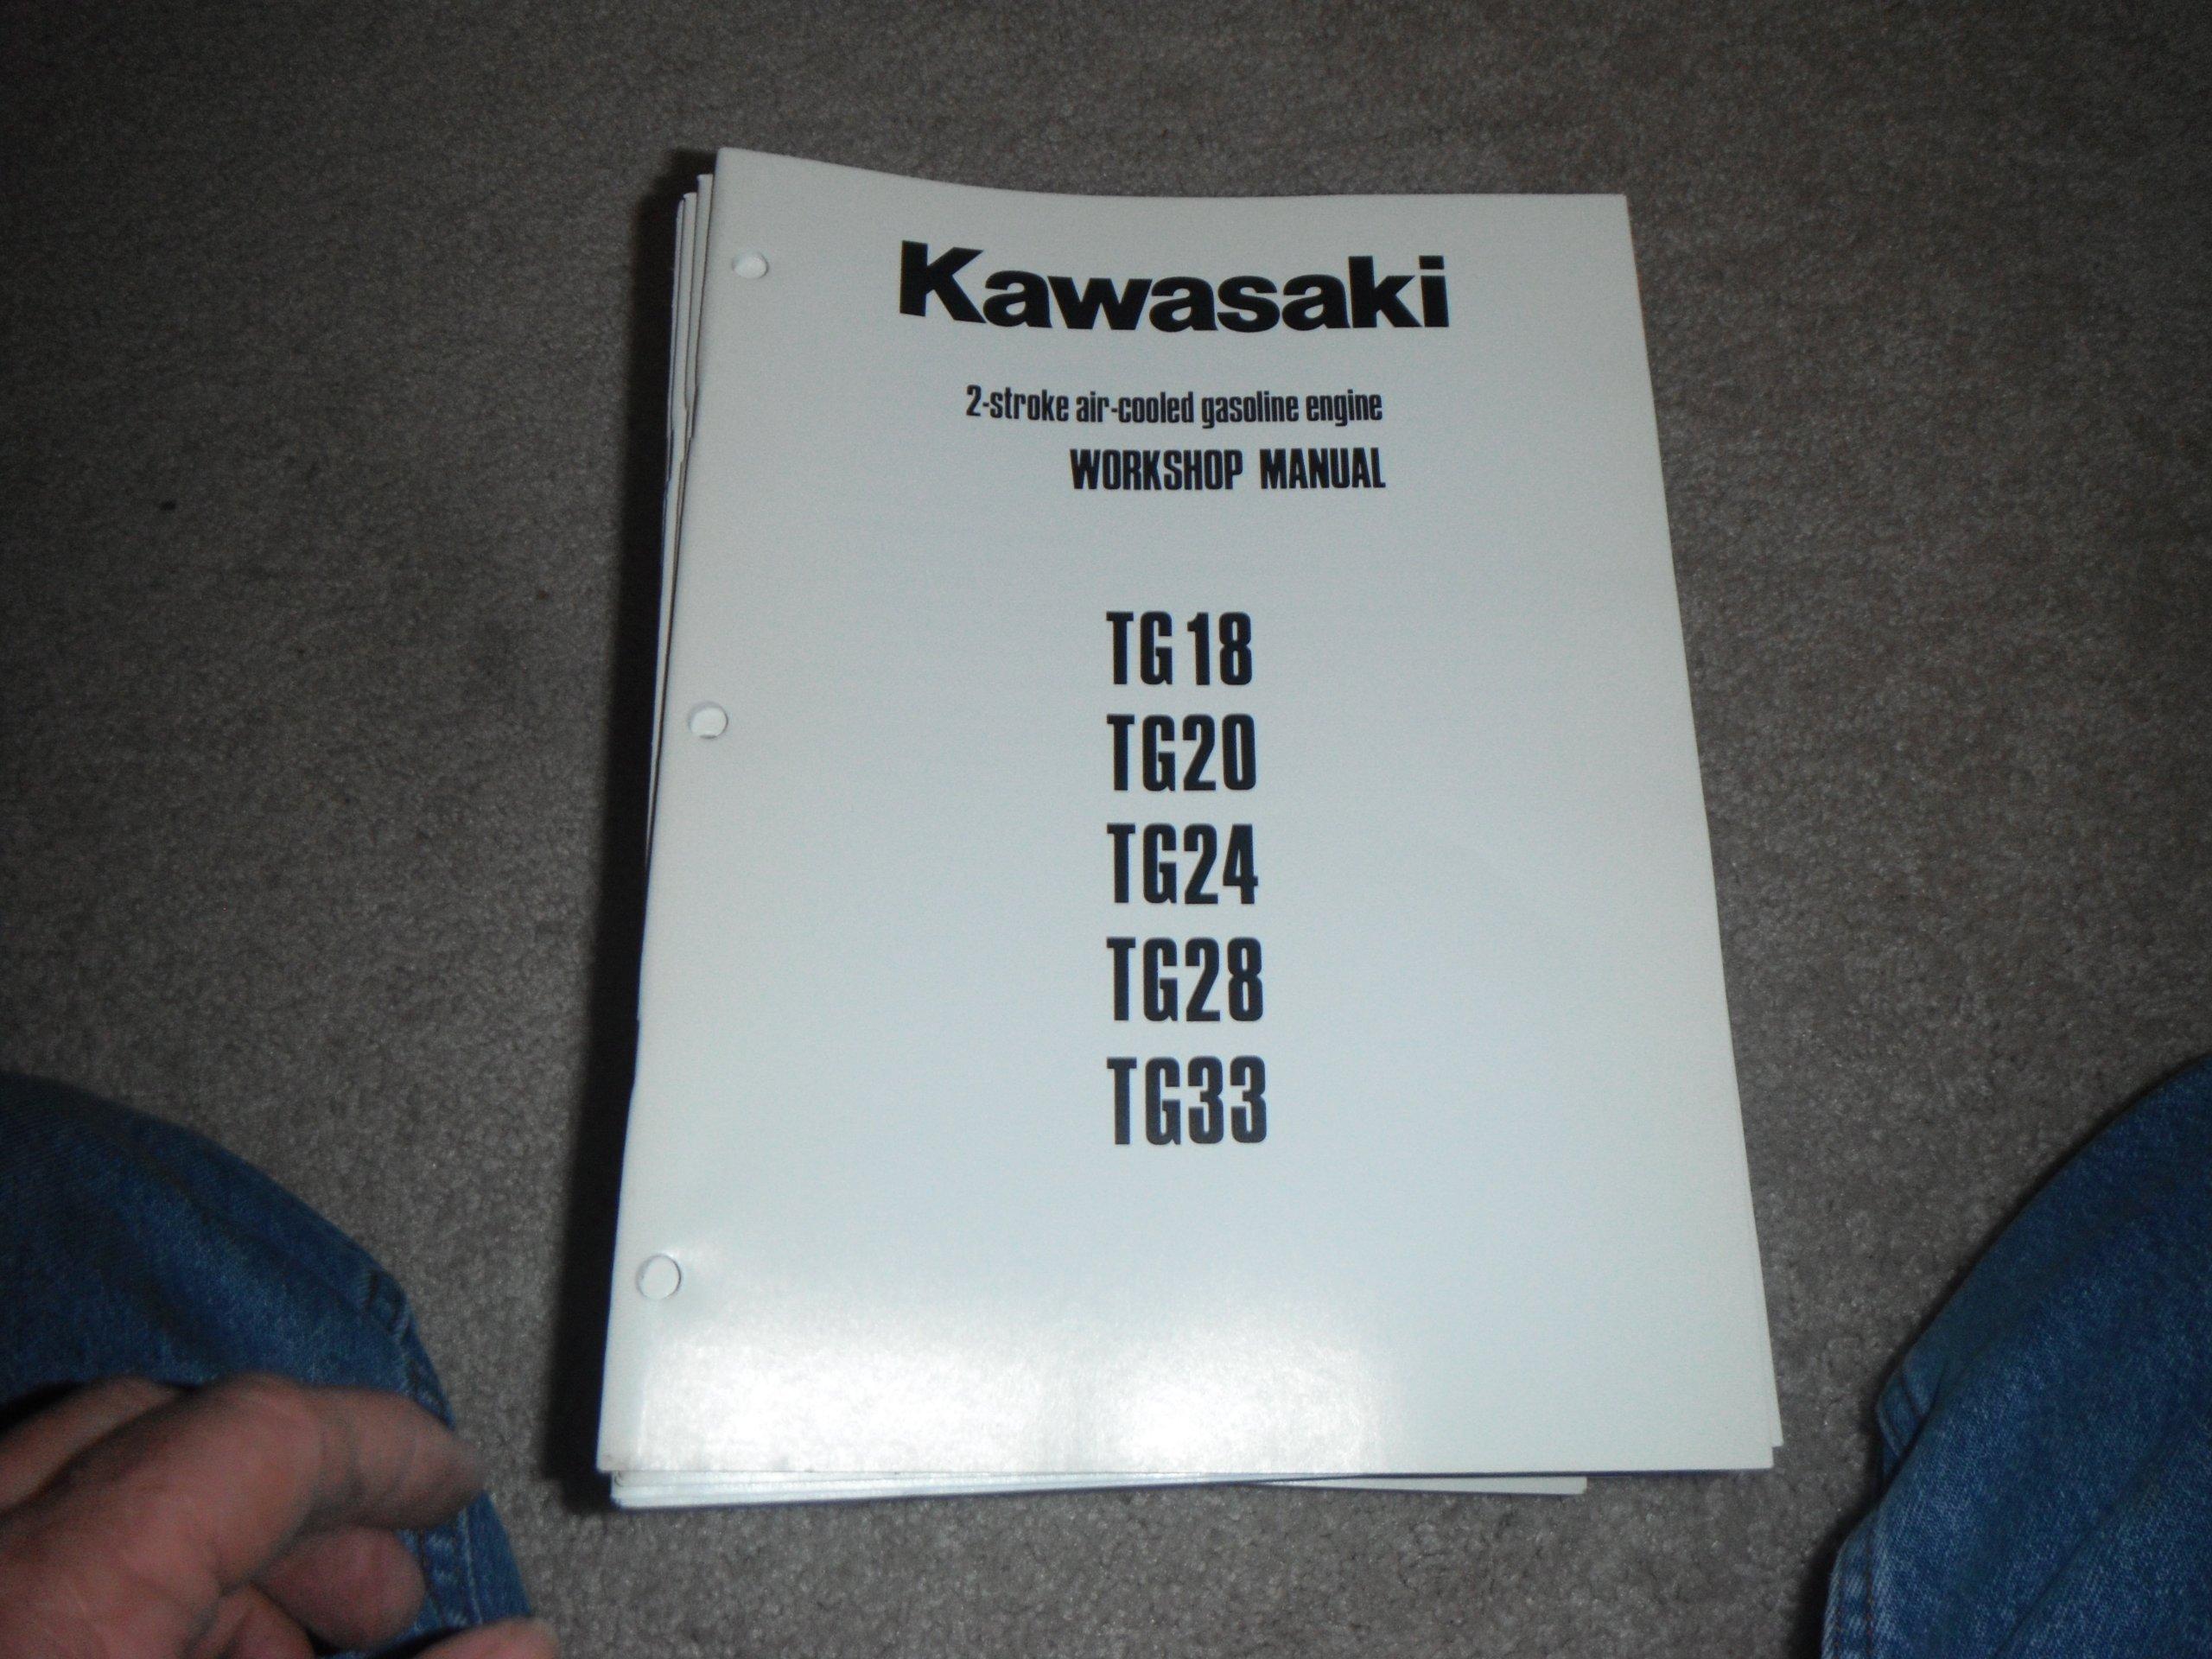 Kawasaki Tg18, 20, 24 28, 33 -2 Stroke Air-cooled Gasoline Engine Service  Manual: kawasaki heavy industries: Amazon.com: Books